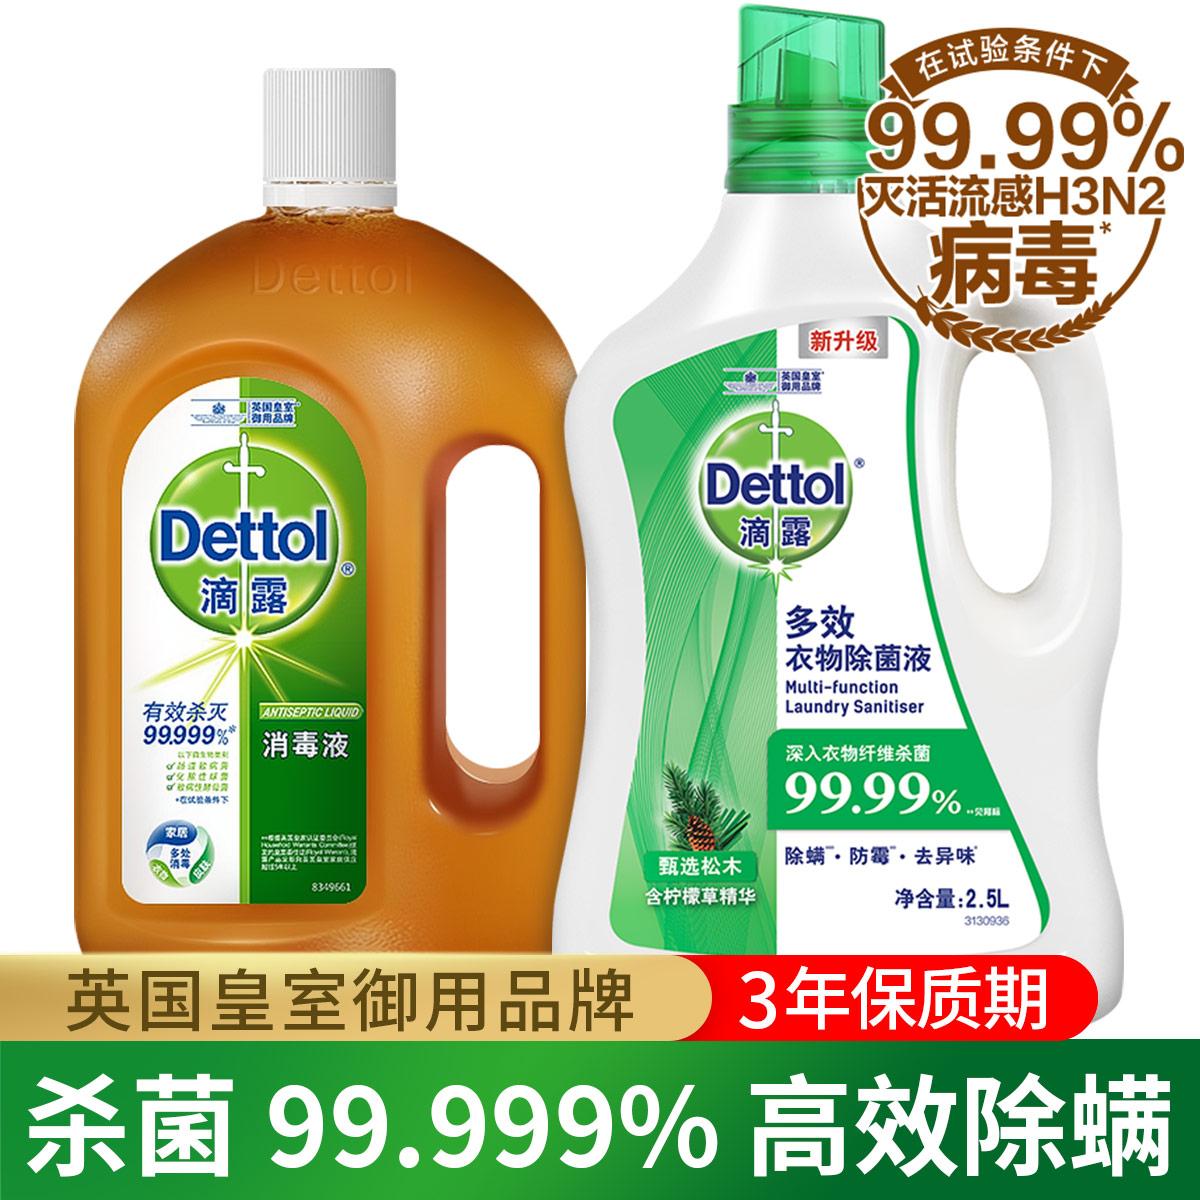 Dettol 【 杀菌除螨】滴露消毒液1.8L+多效除菌液2.5L 长效7天抑菌除螨